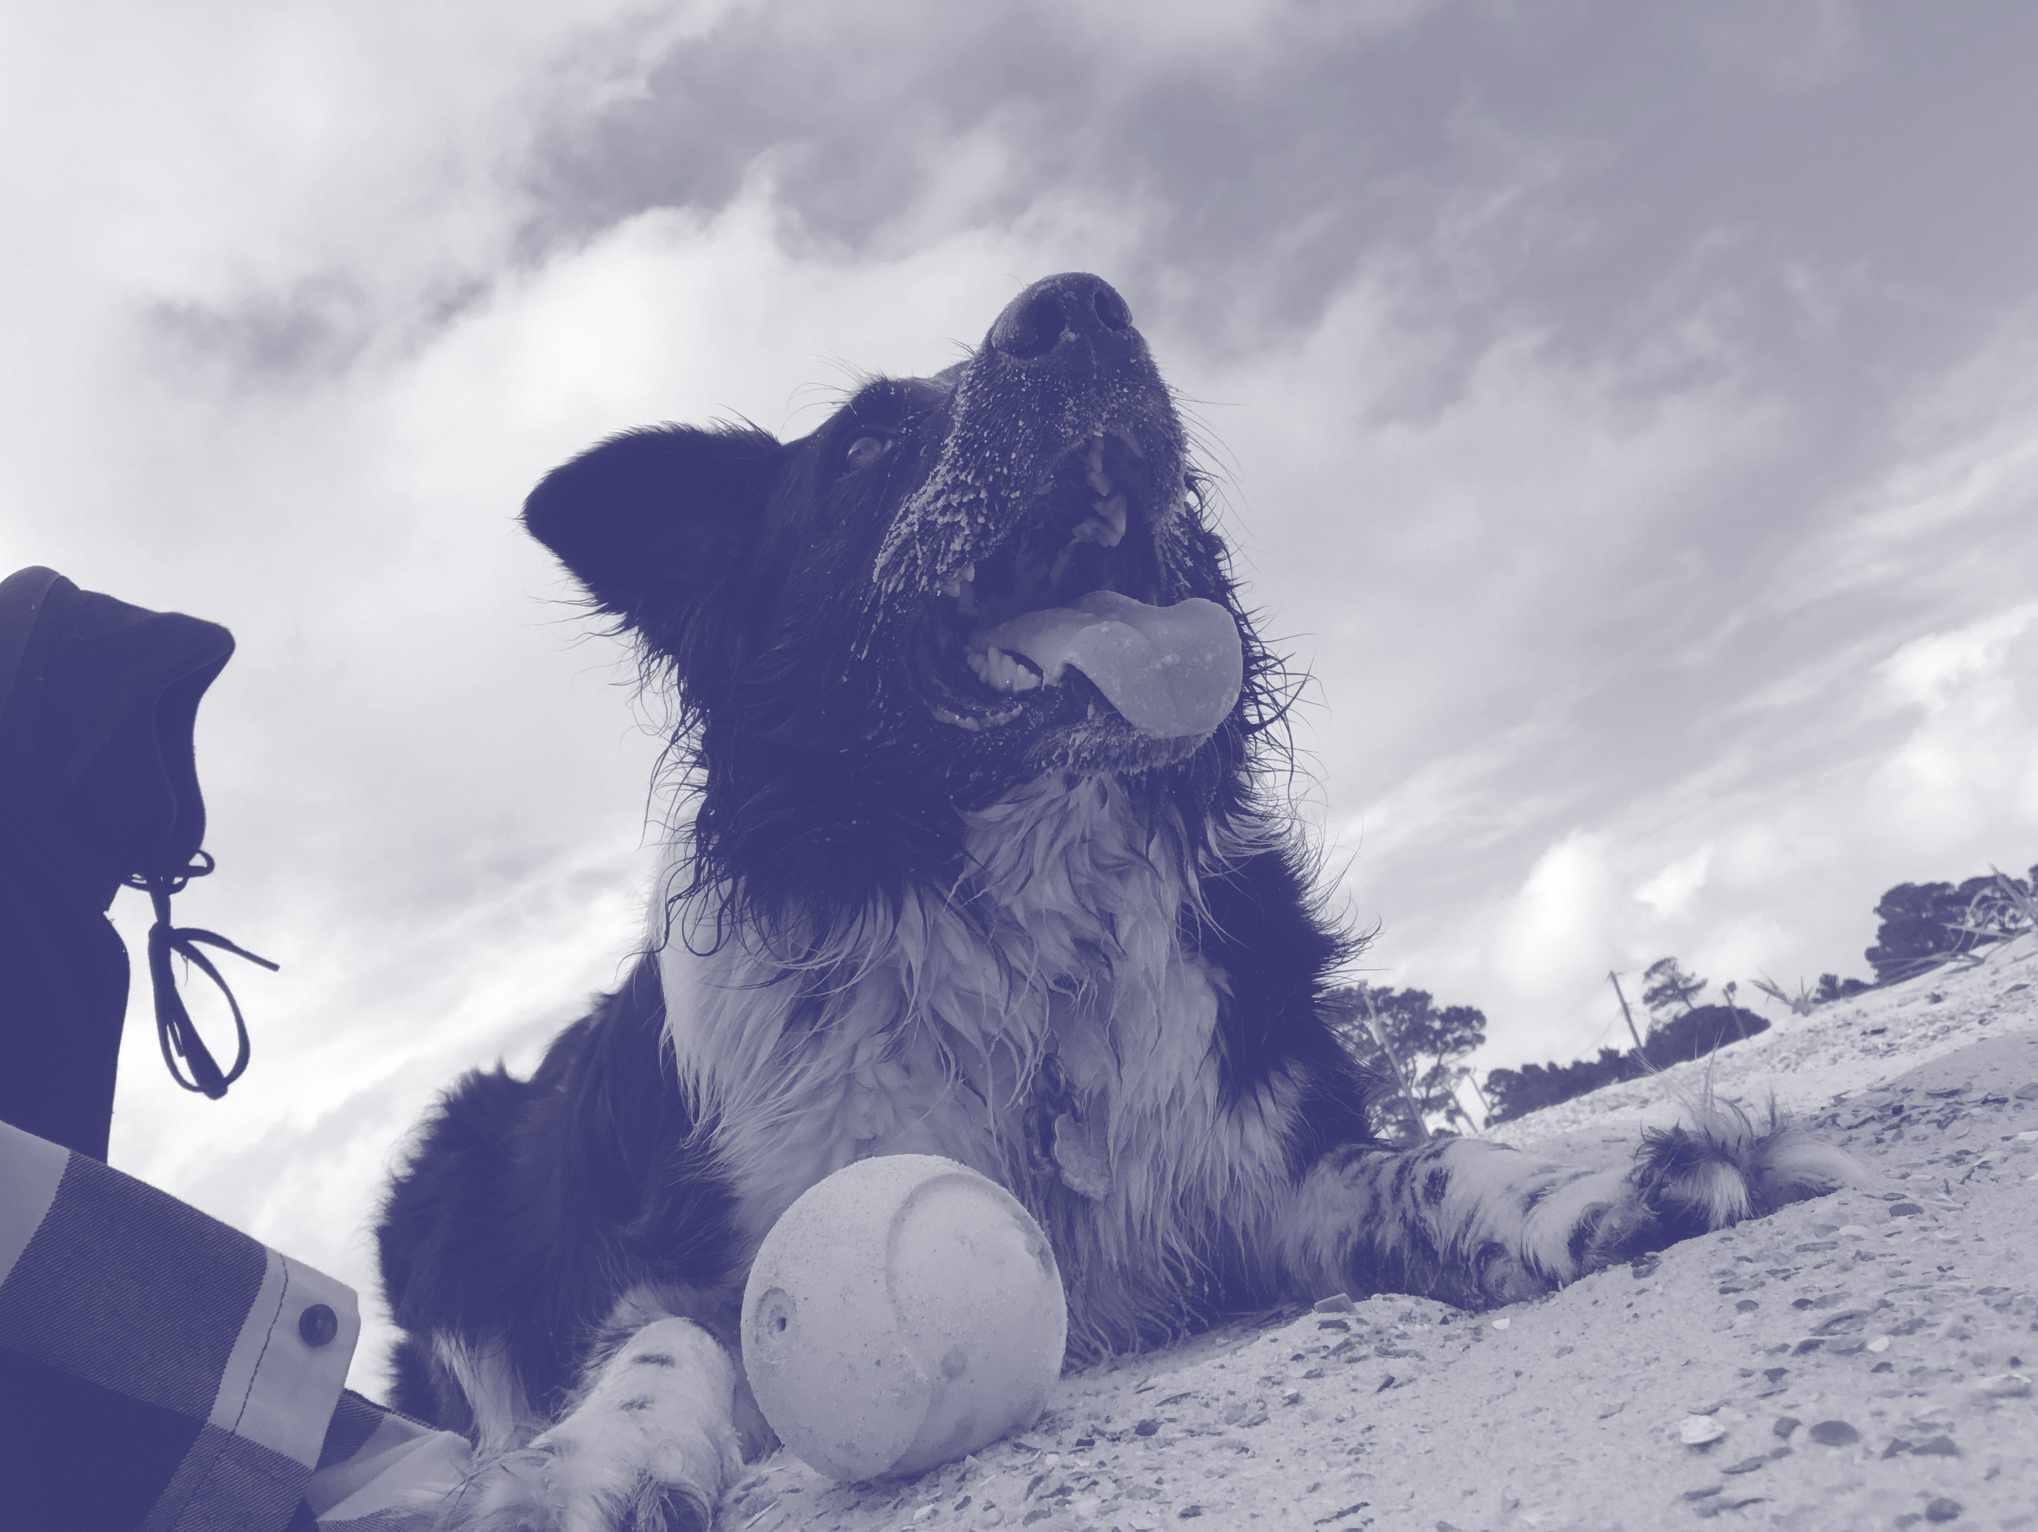 A monochrome image of an Australian Shepherd on the beach.